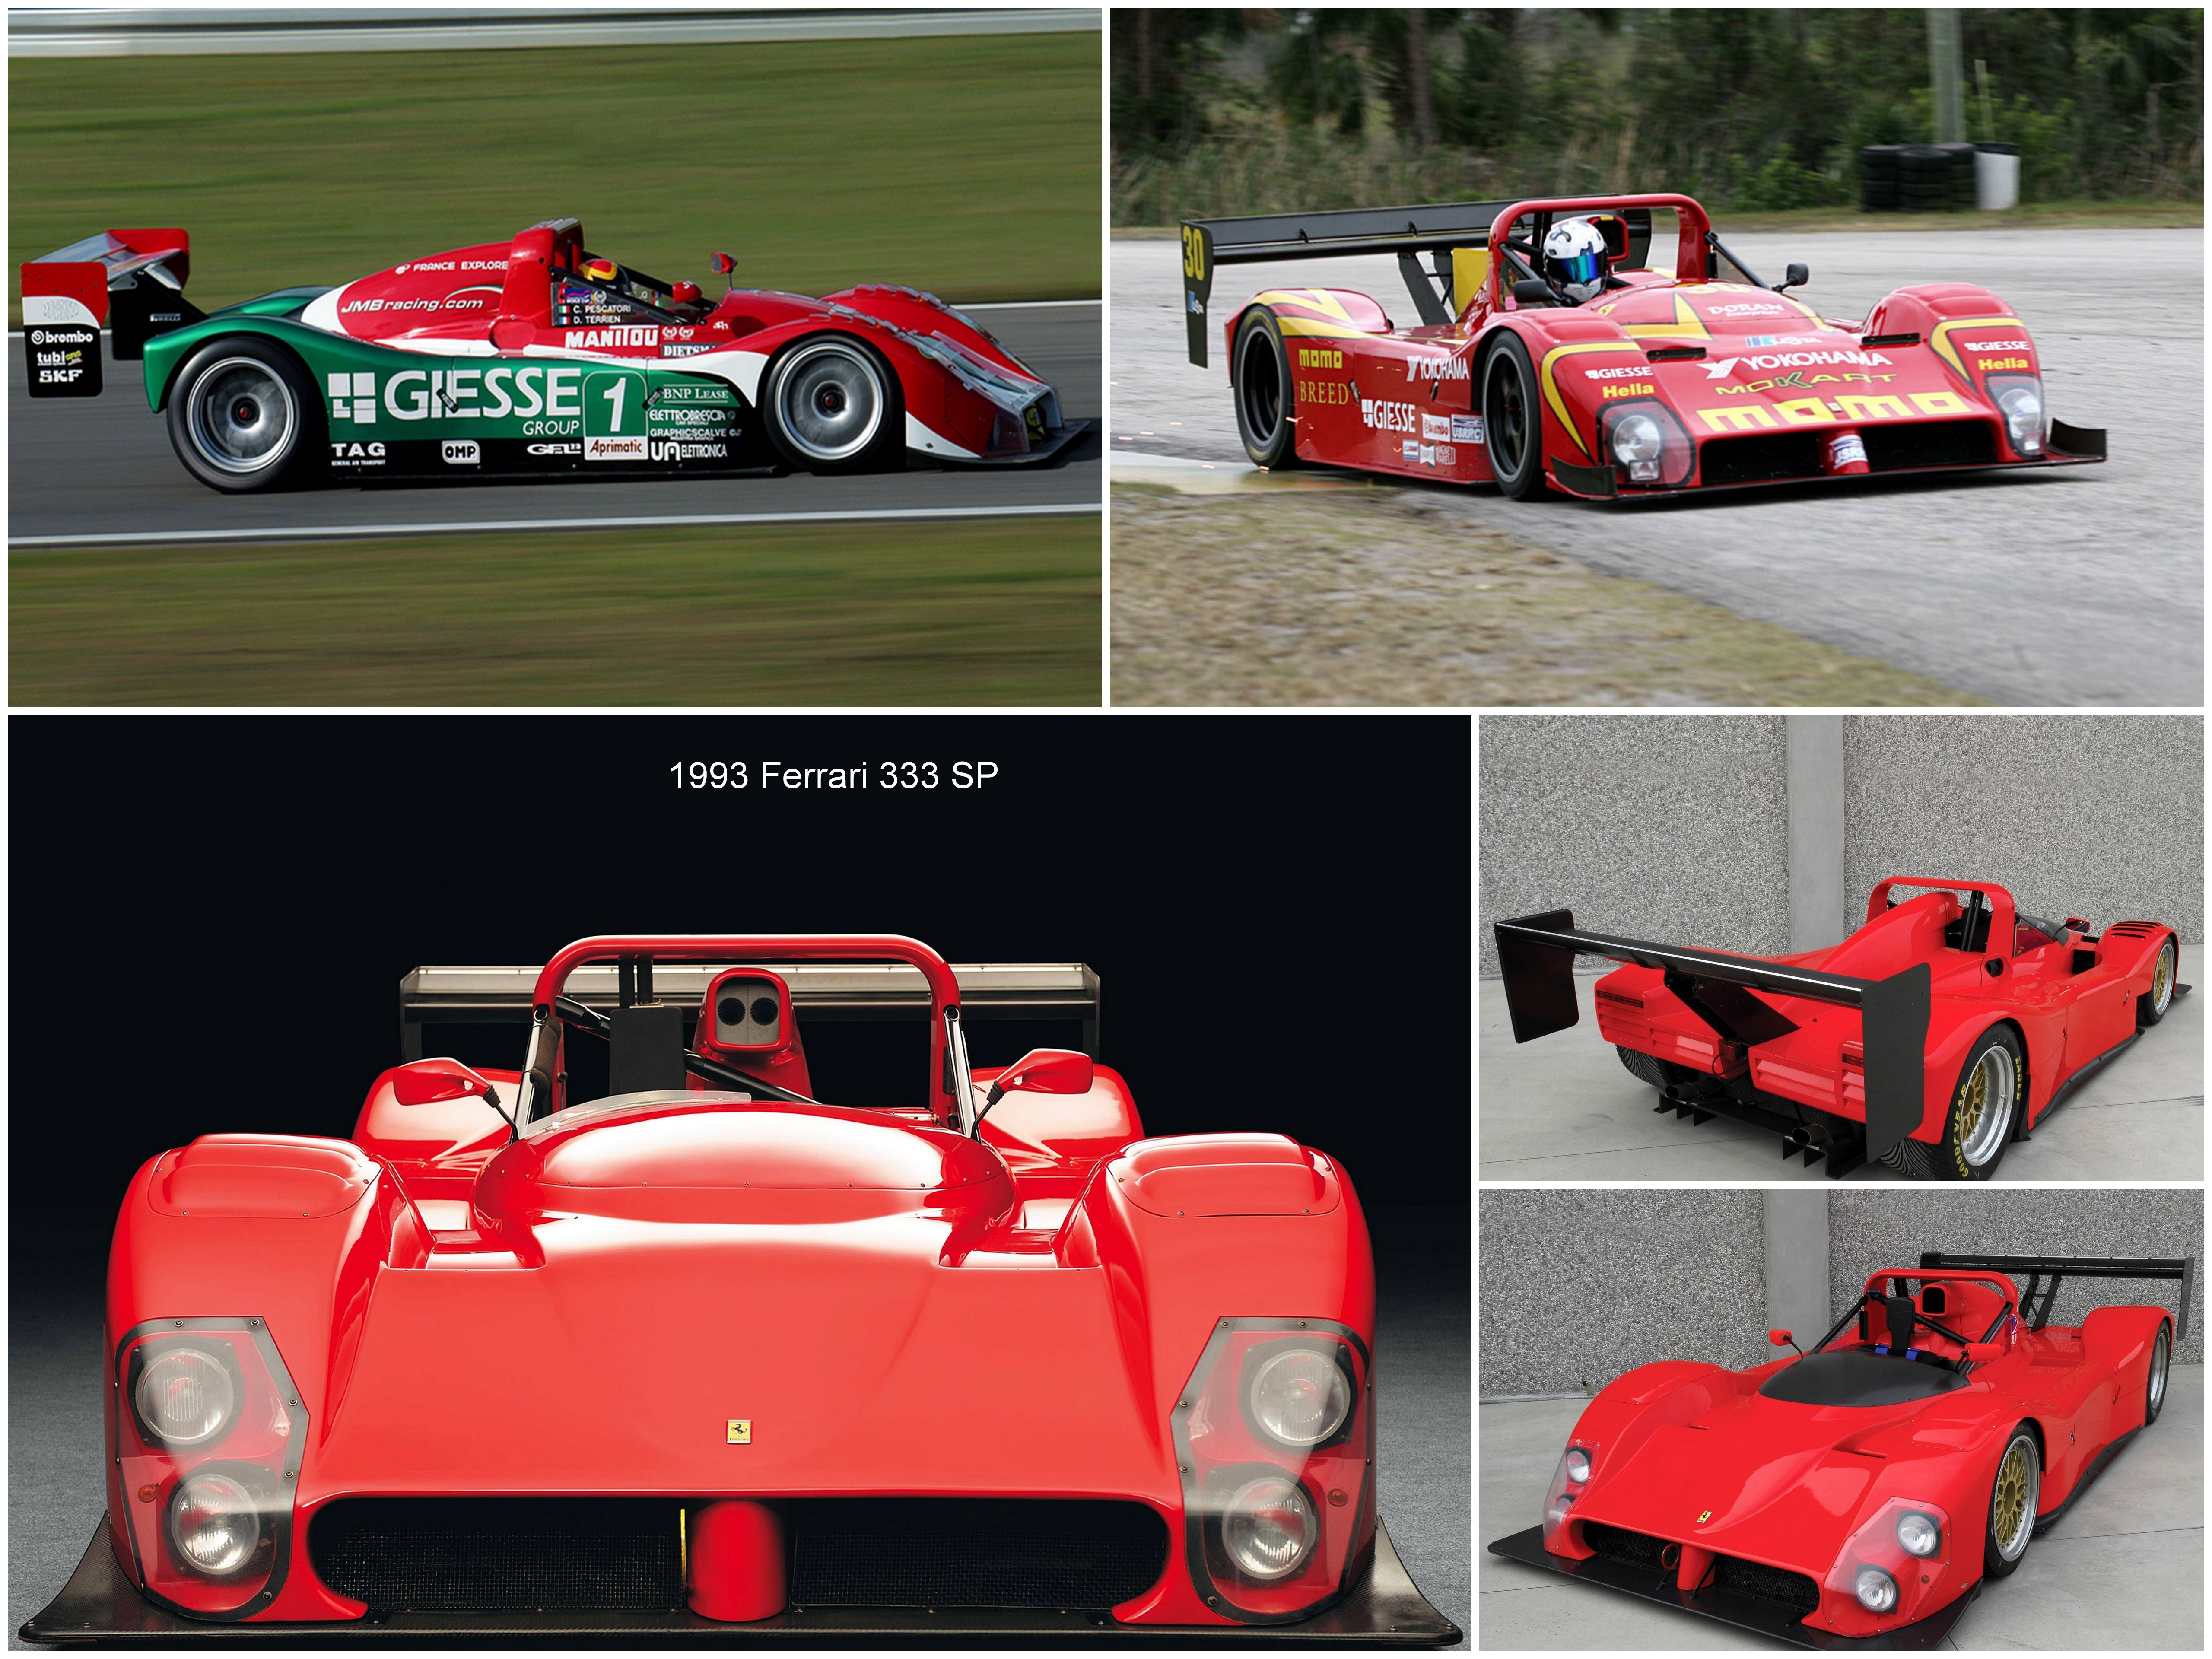 Ferrari 333 SP 1993